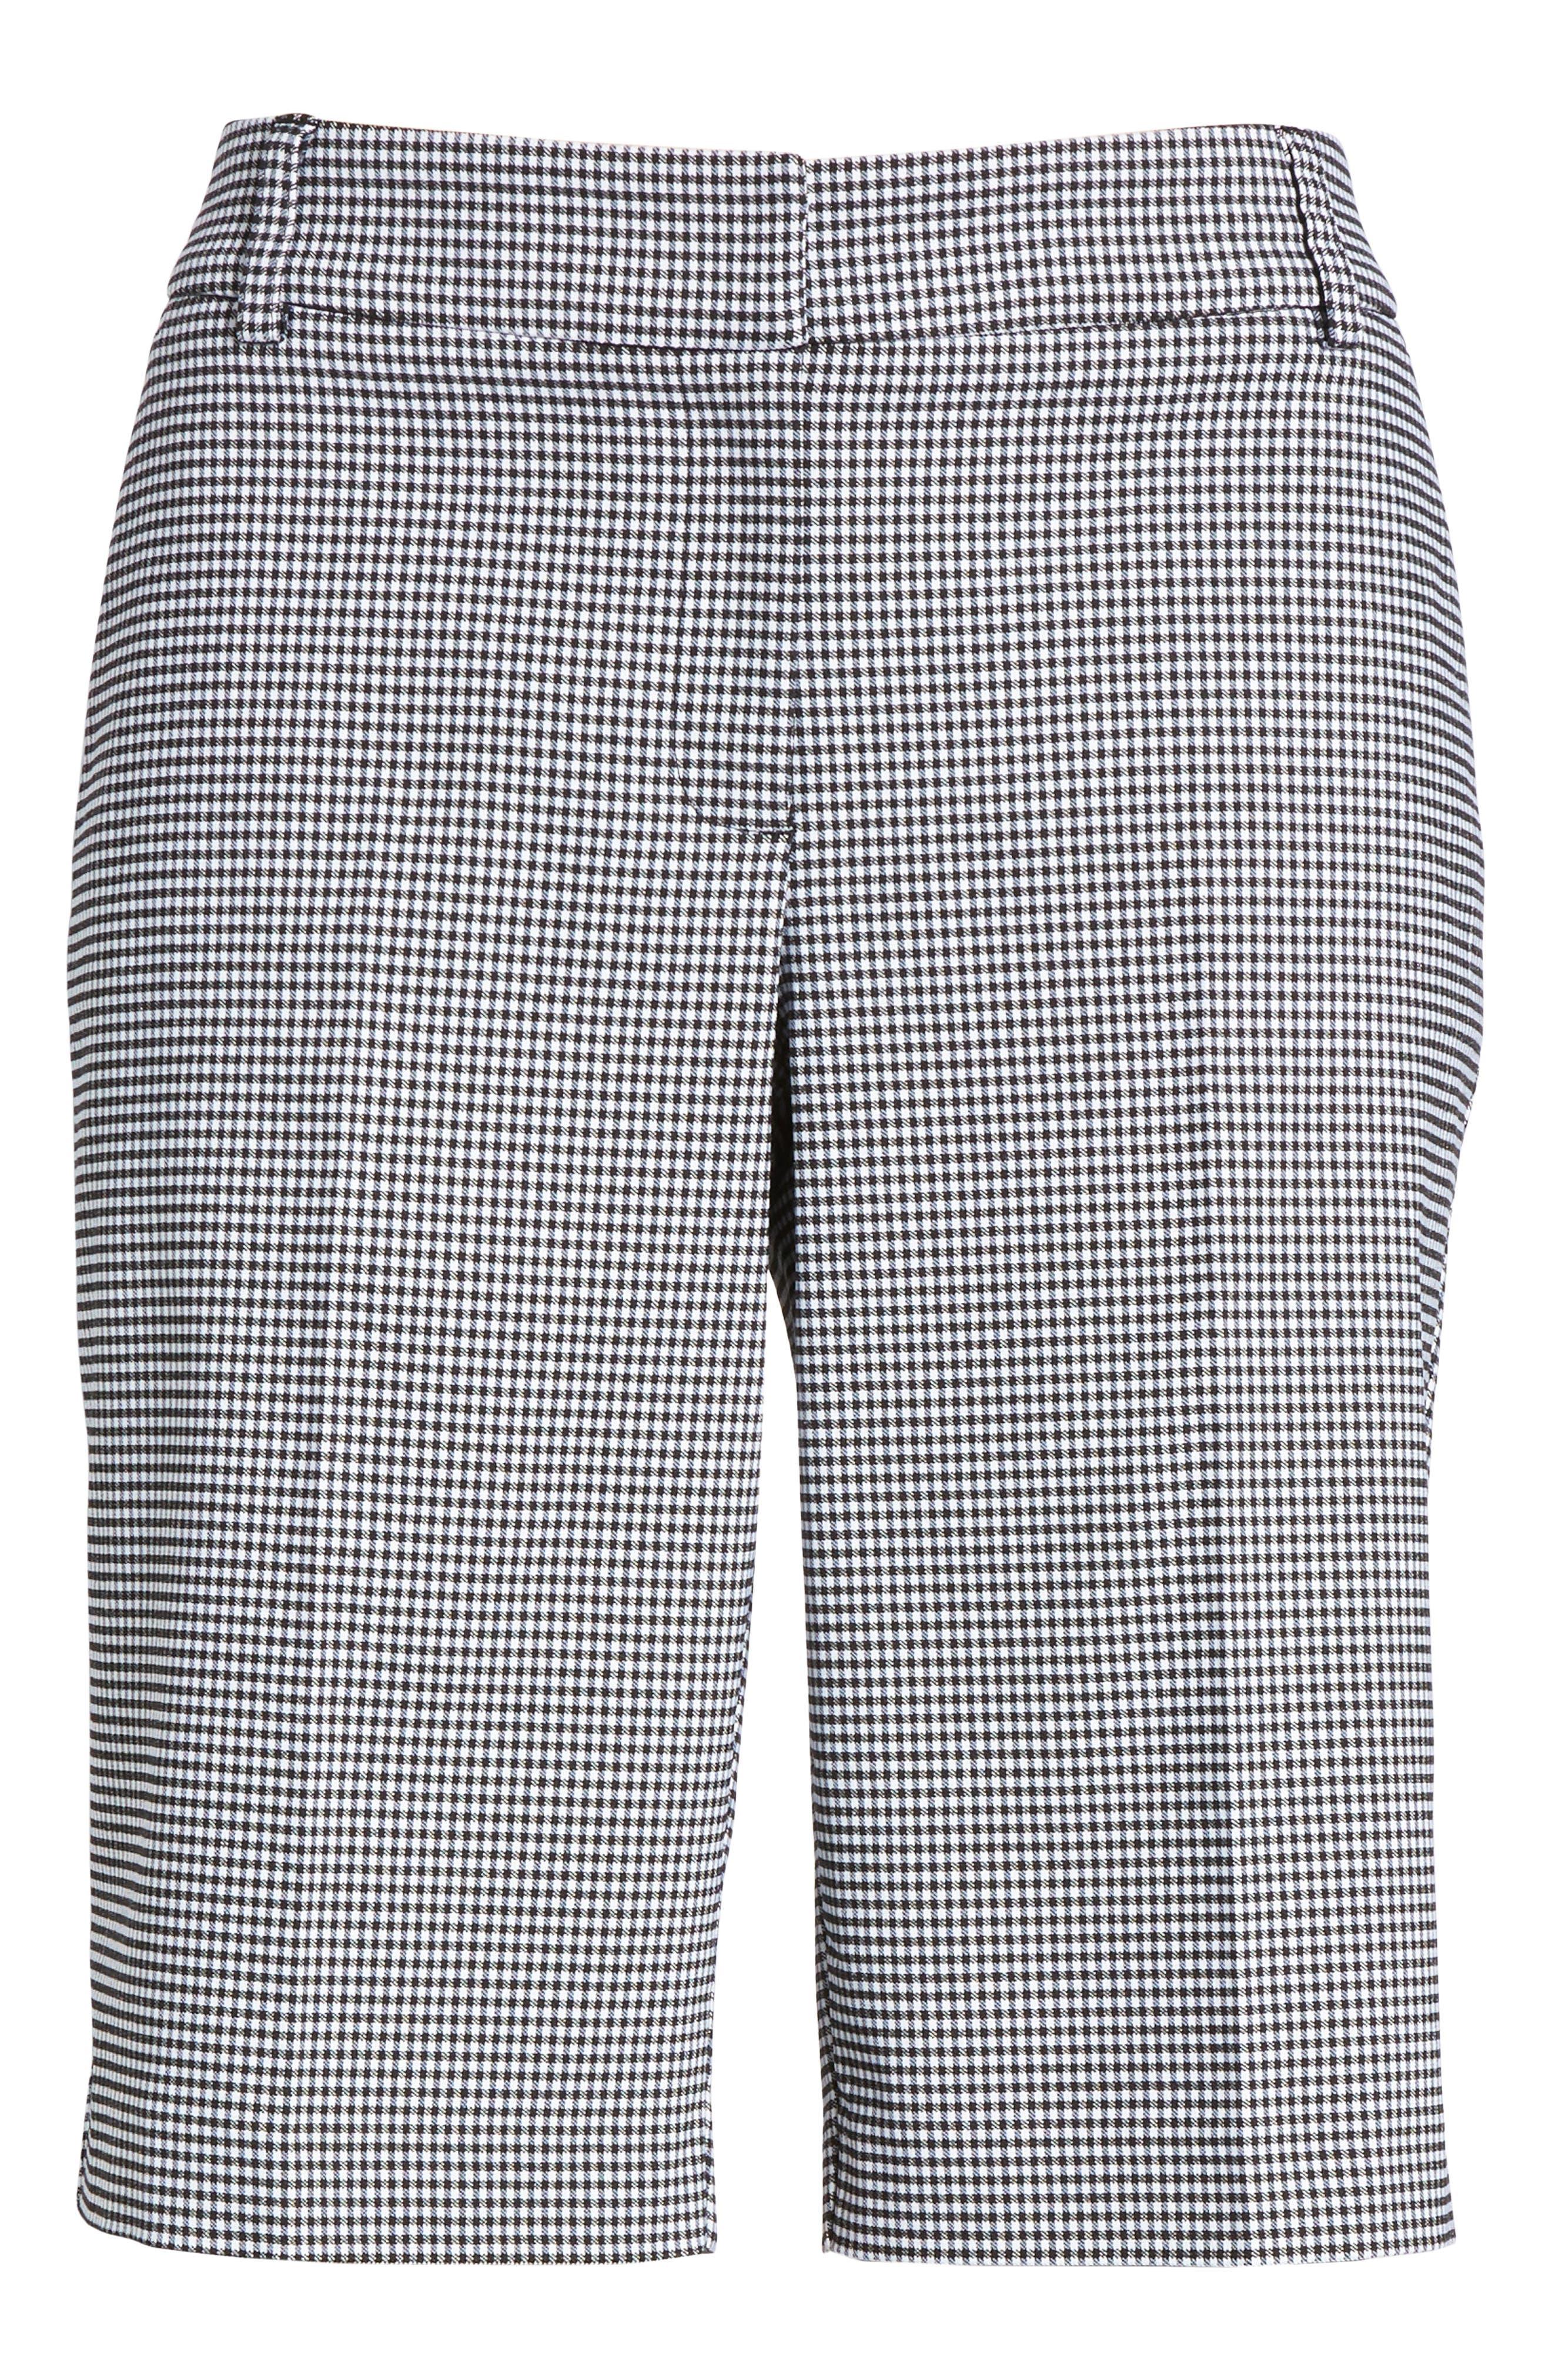 Stretch Bermuda Shorts,                             Alternate thumbnail 6, color,                             Black- White Gingham